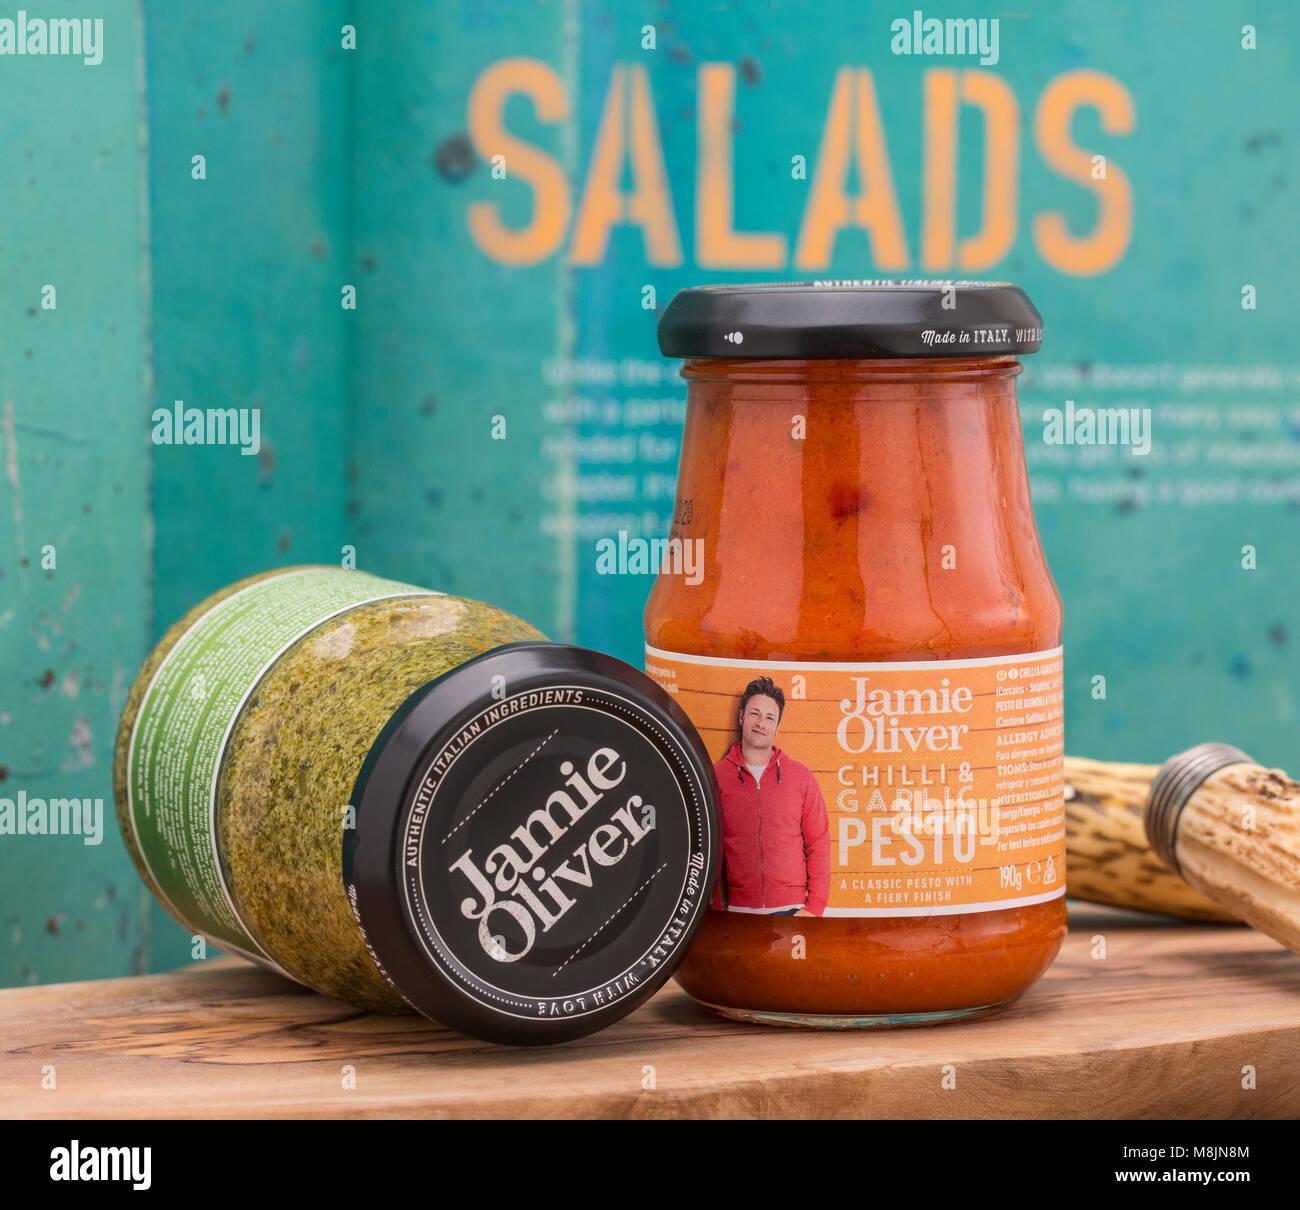 SWINDON, UK - MARCH 18, 2018: Two Jars of Jamie Oliver Pesto, Authentic Italian Ingredients - Stock Image